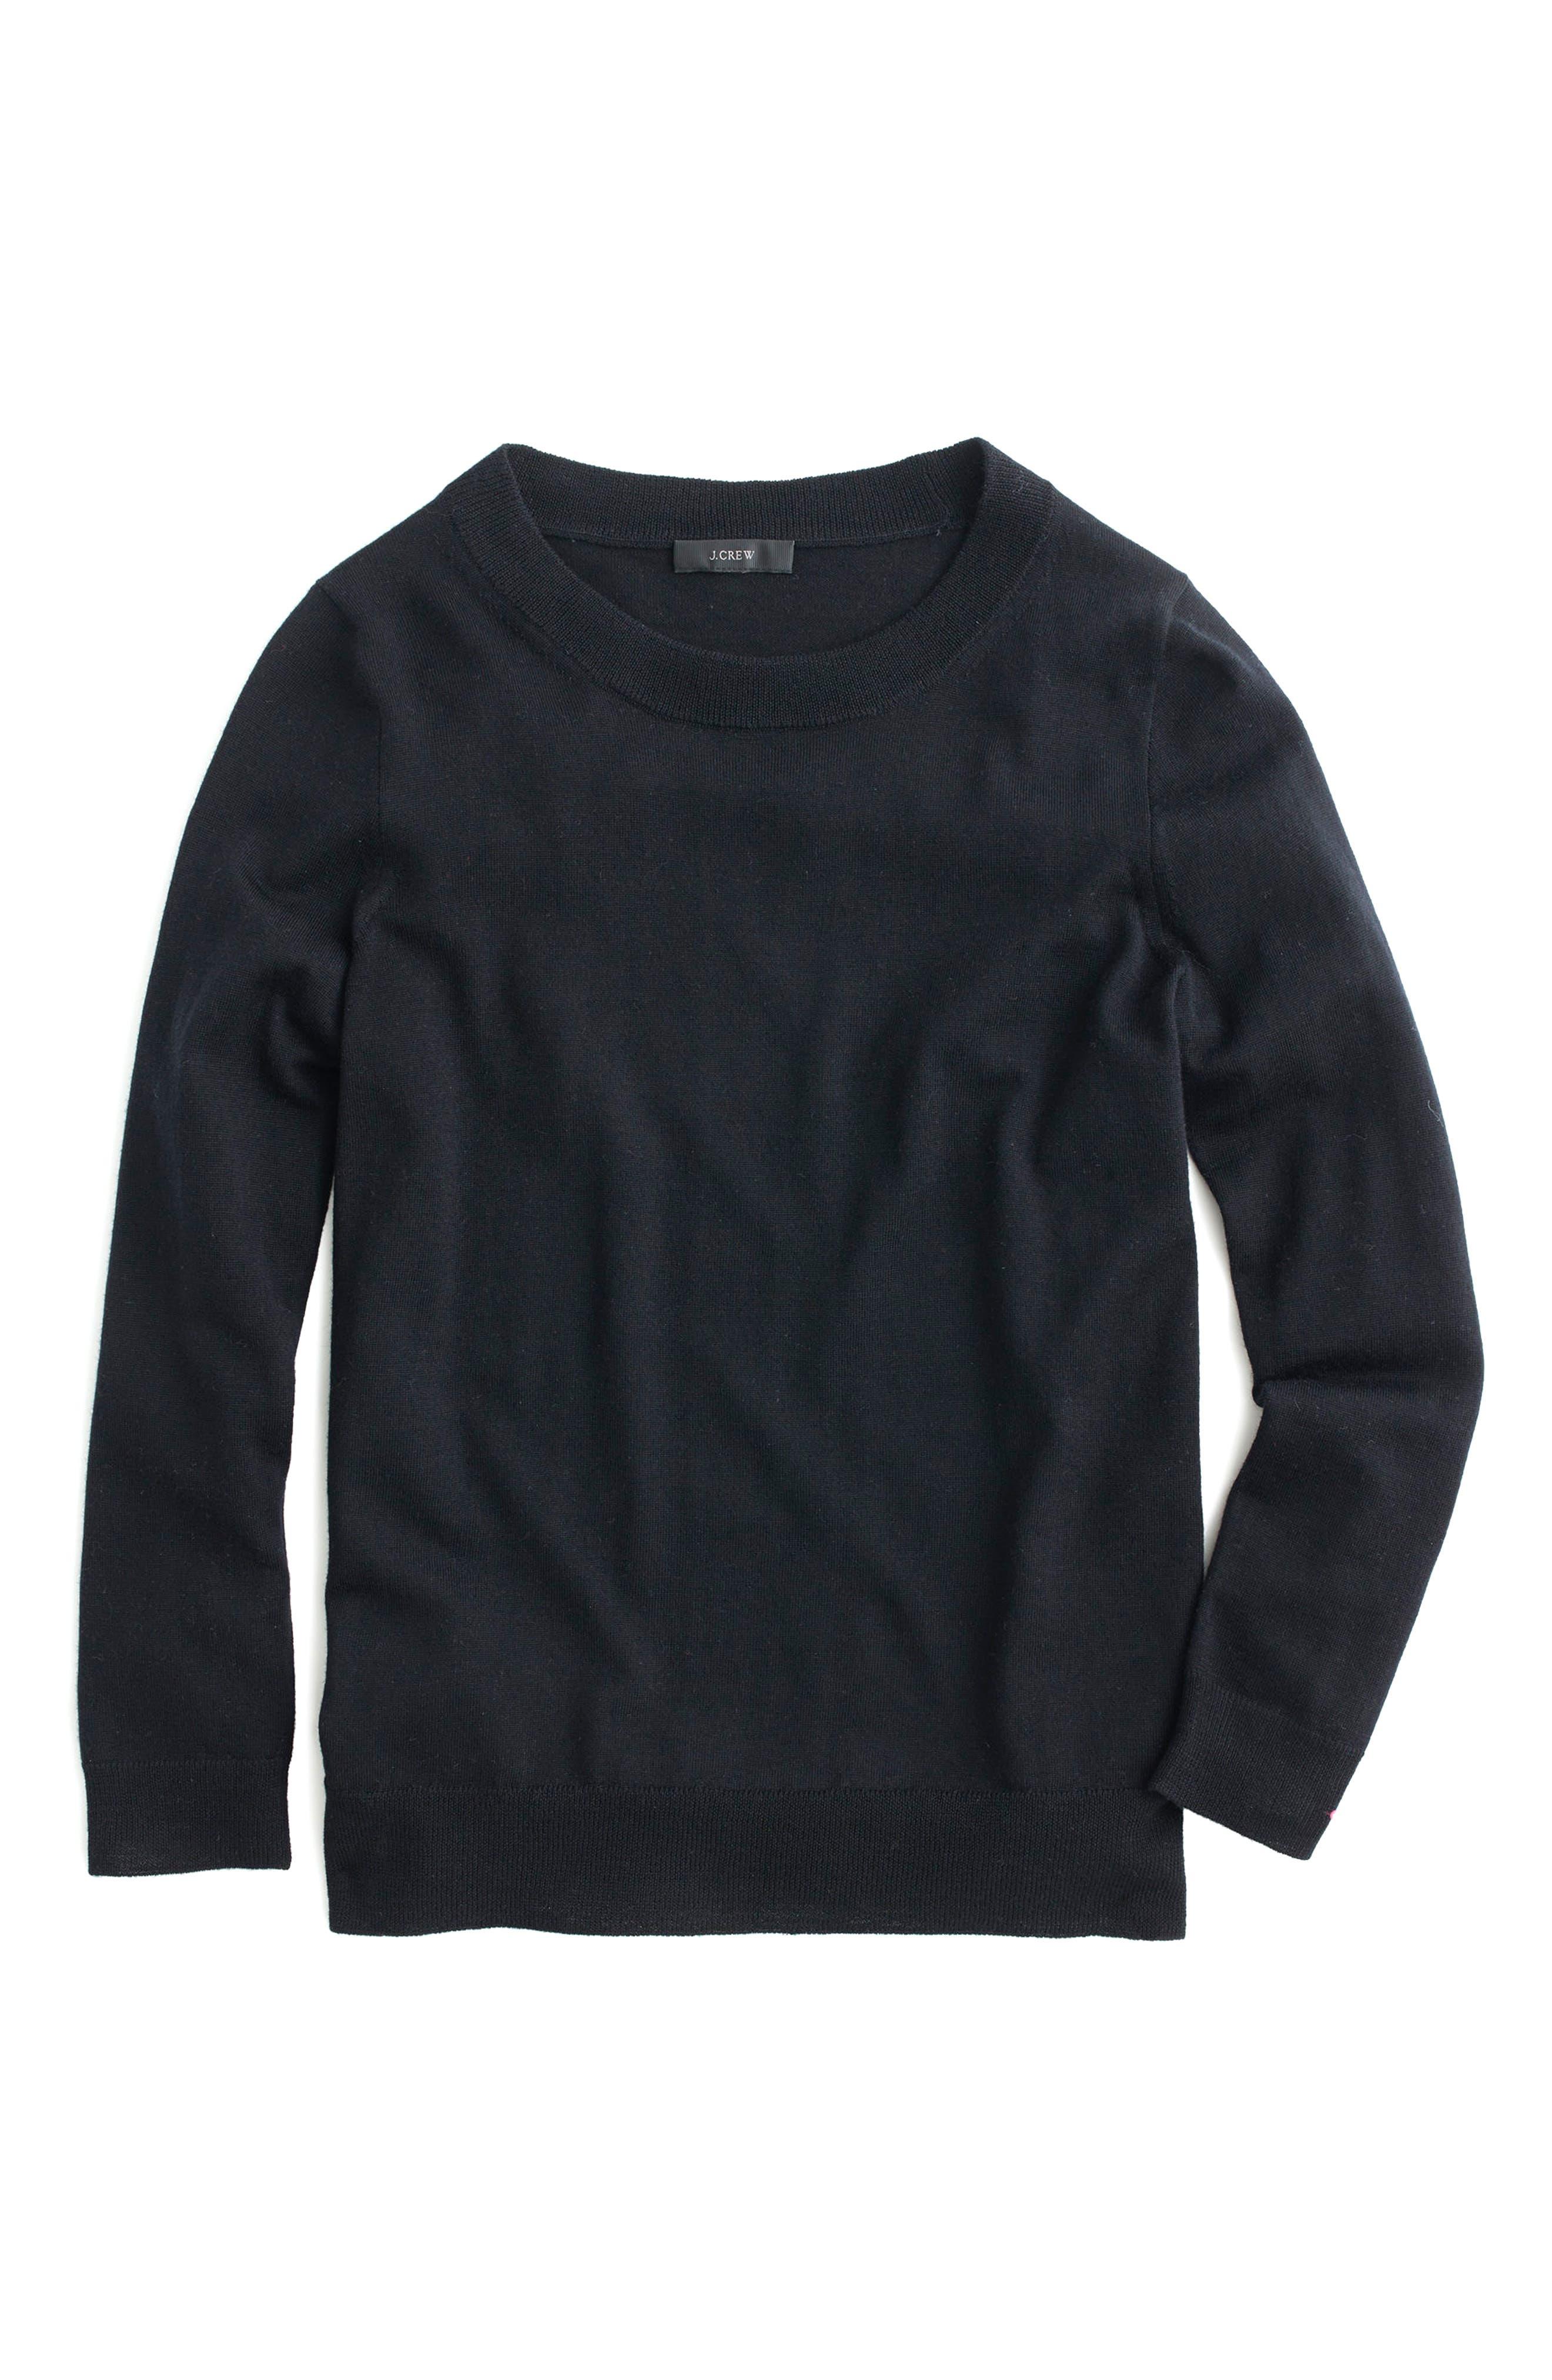 Tippi Merino Wool Sweater,                         Main,                         color, BLACK